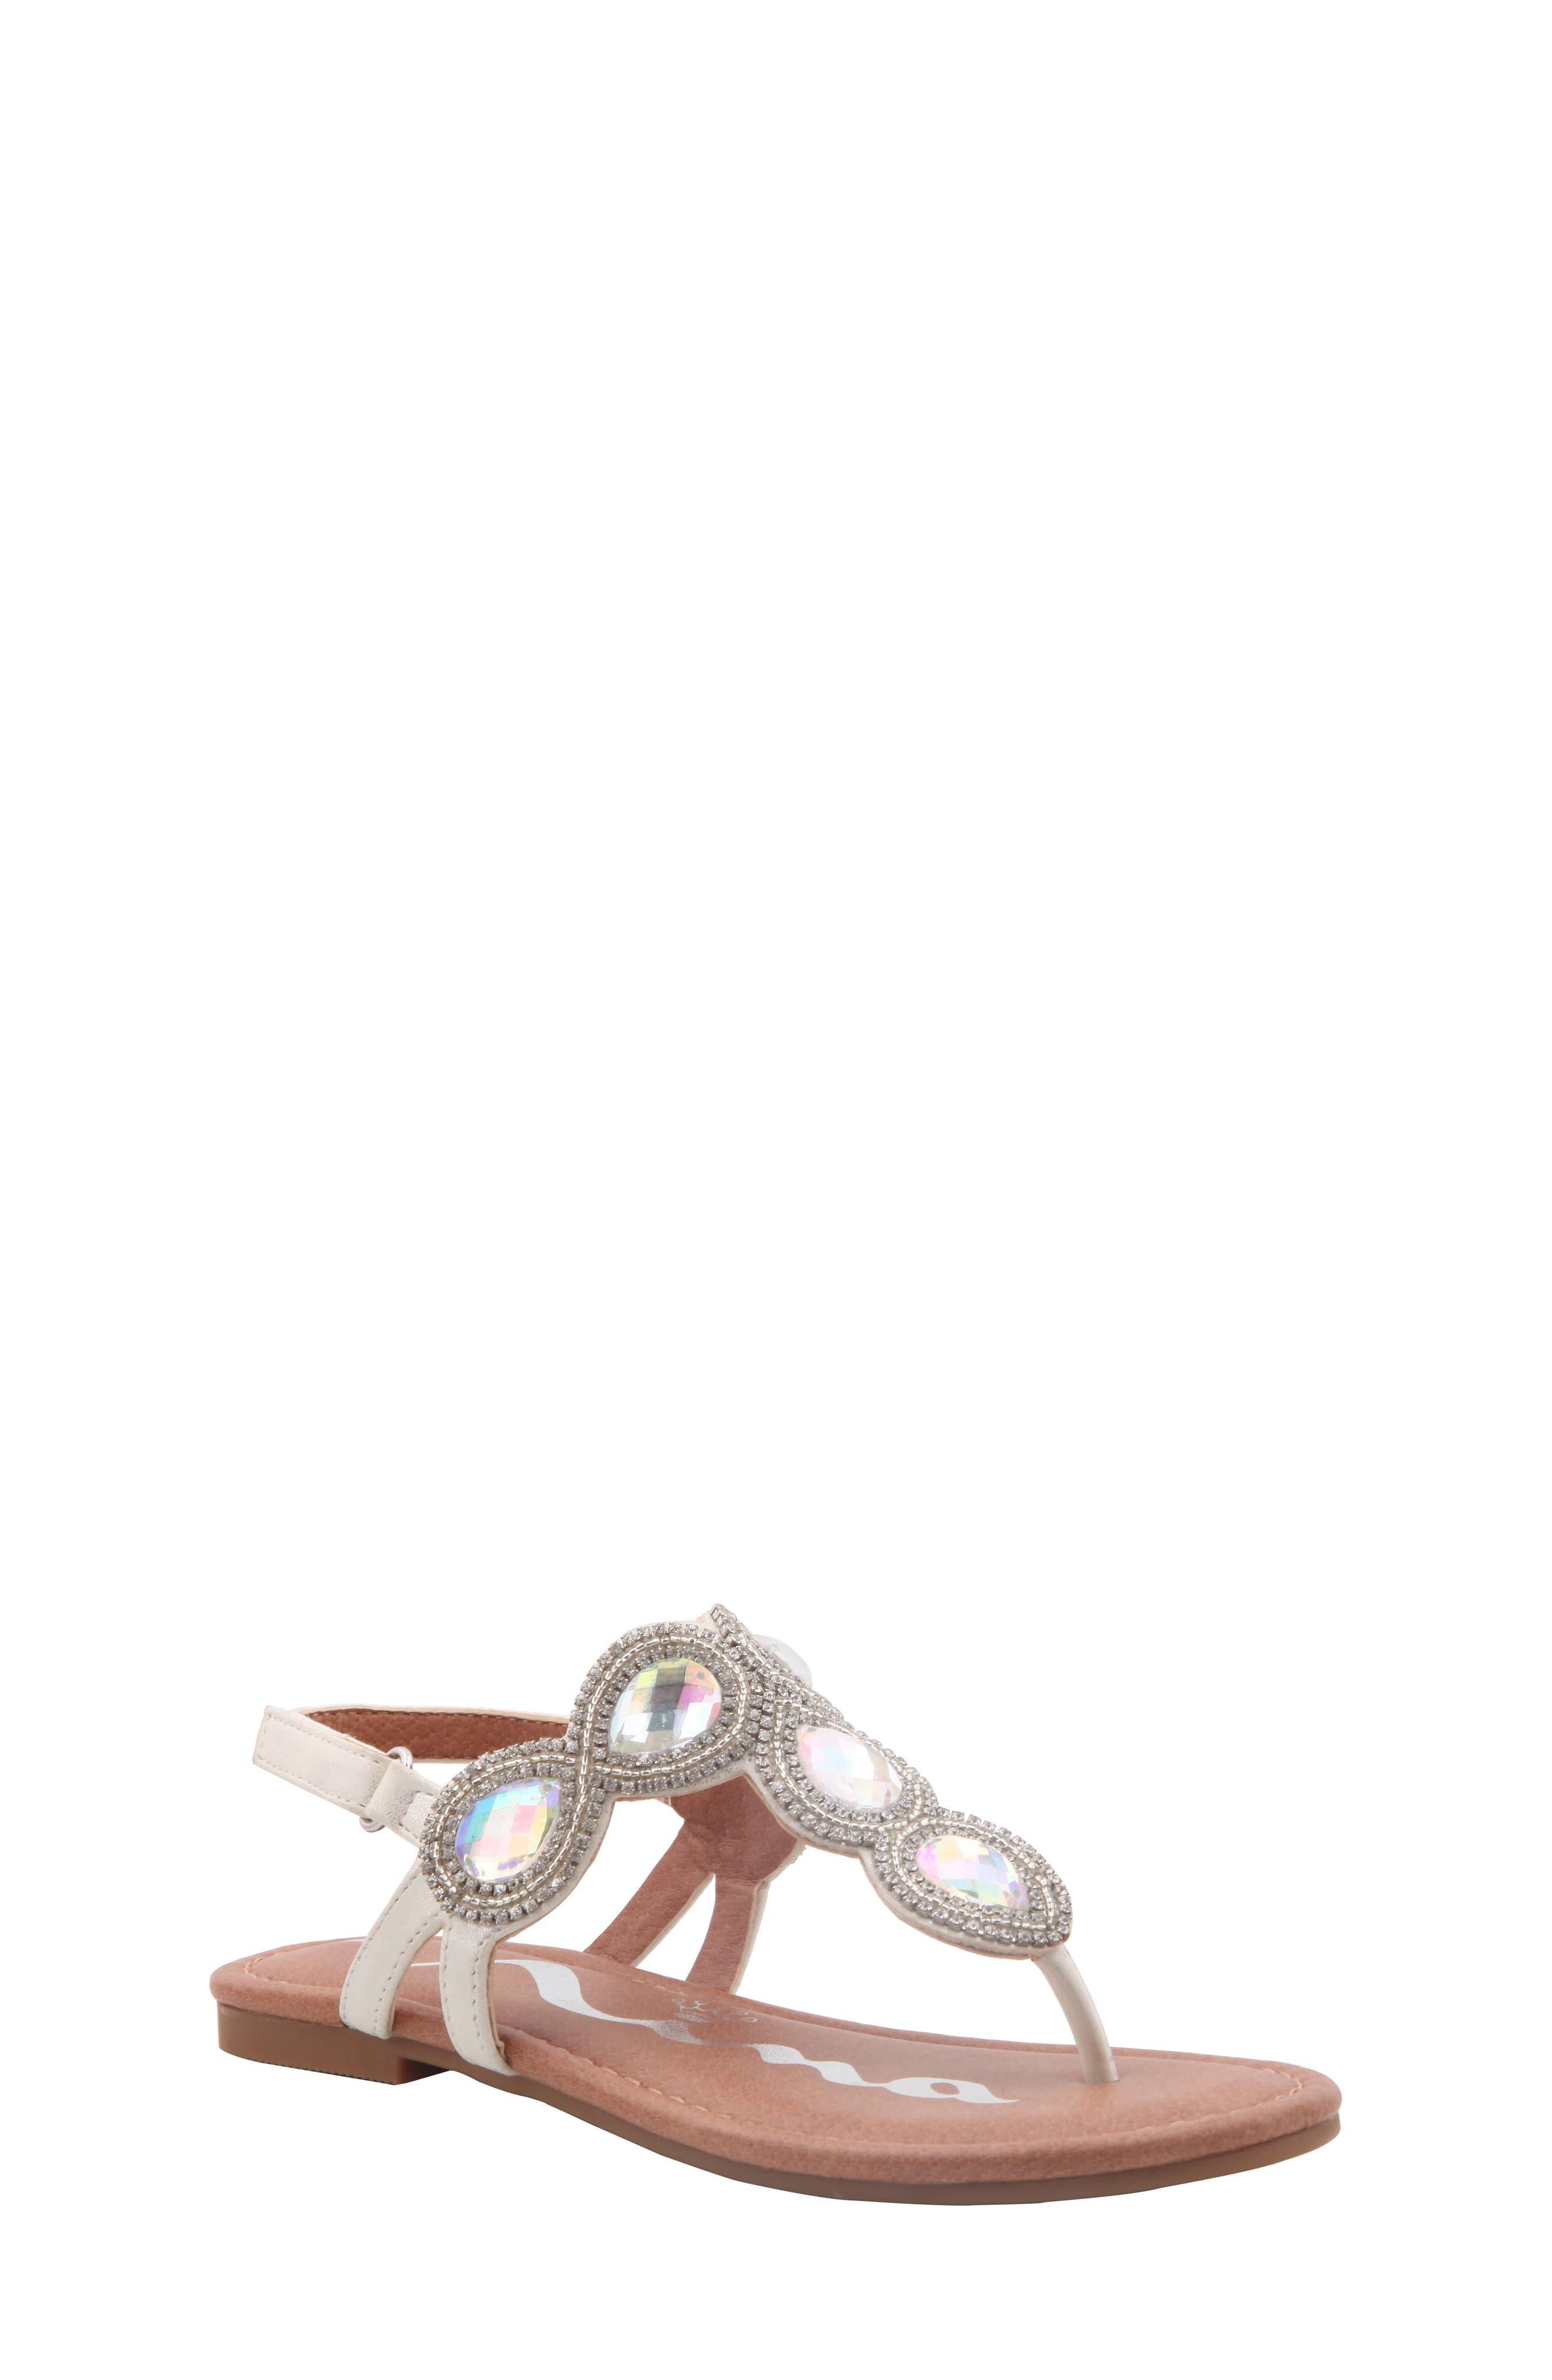 Elicia Embellished T-Strap Sandal,                             Main thumbnail 1, color,                             SILVER METALLIC